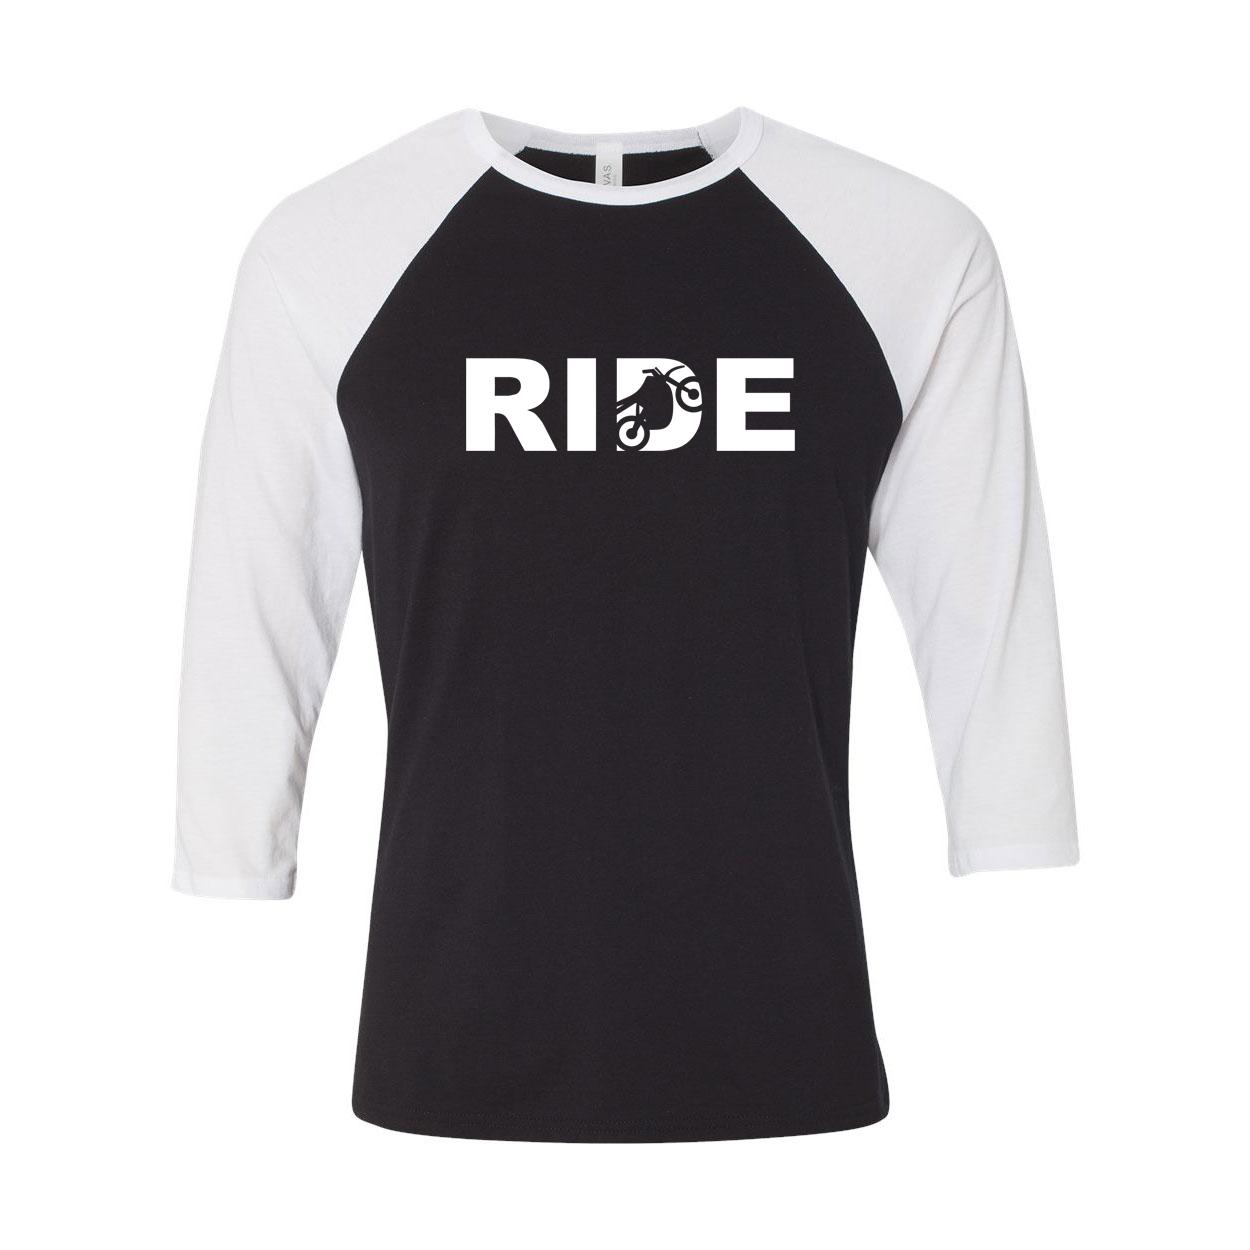 Ride Moto Logo Classic Raglan Shirt Black/White (White Logo)